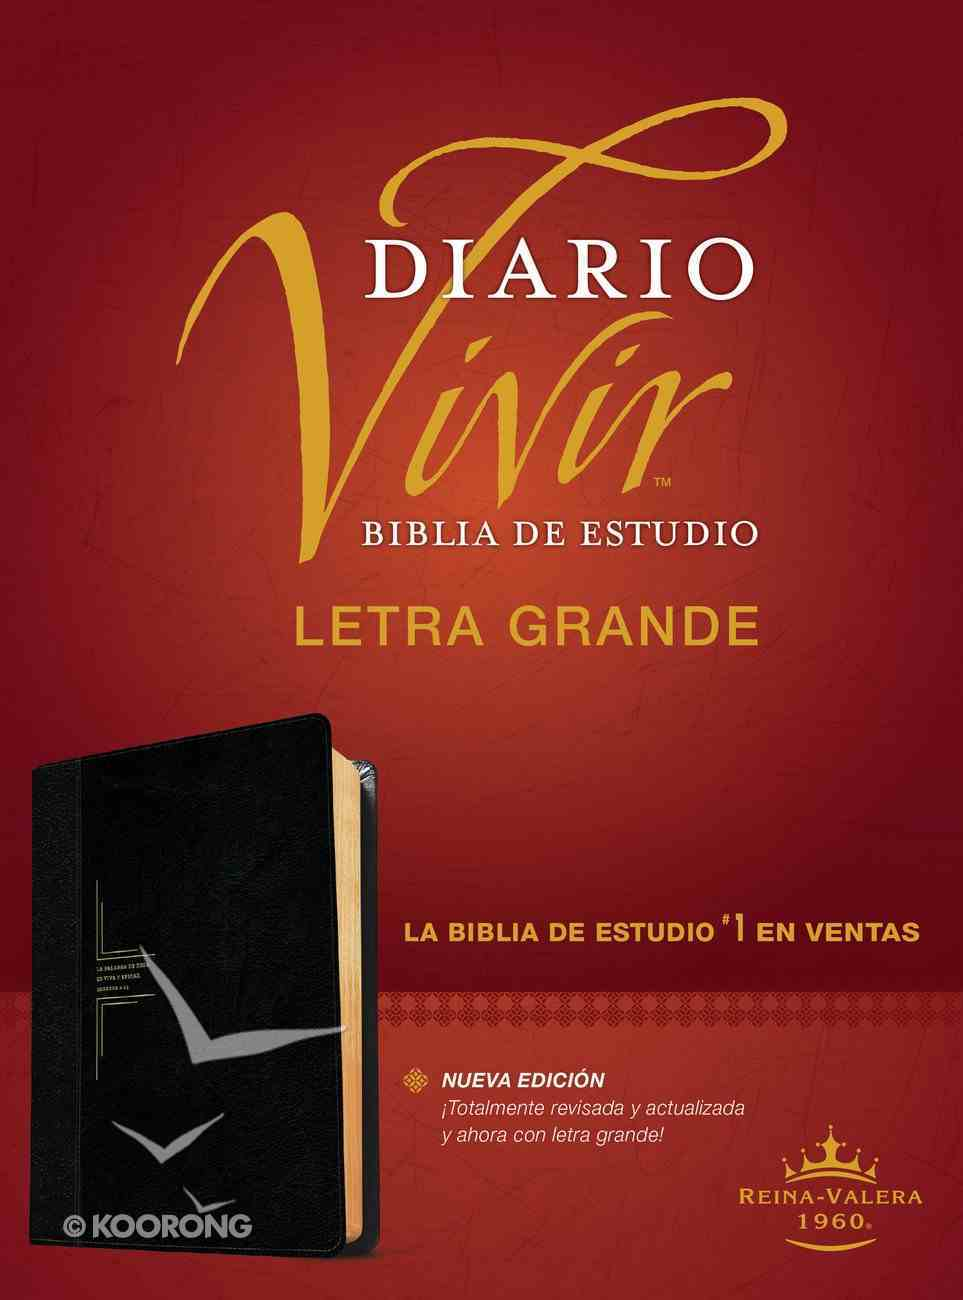 Rvr60 Biblia De Estudio Del Diario Vivir Letra Grande Negro/Onice (Red Letter Edition) (Large Print Study Bible) Imitation Leather